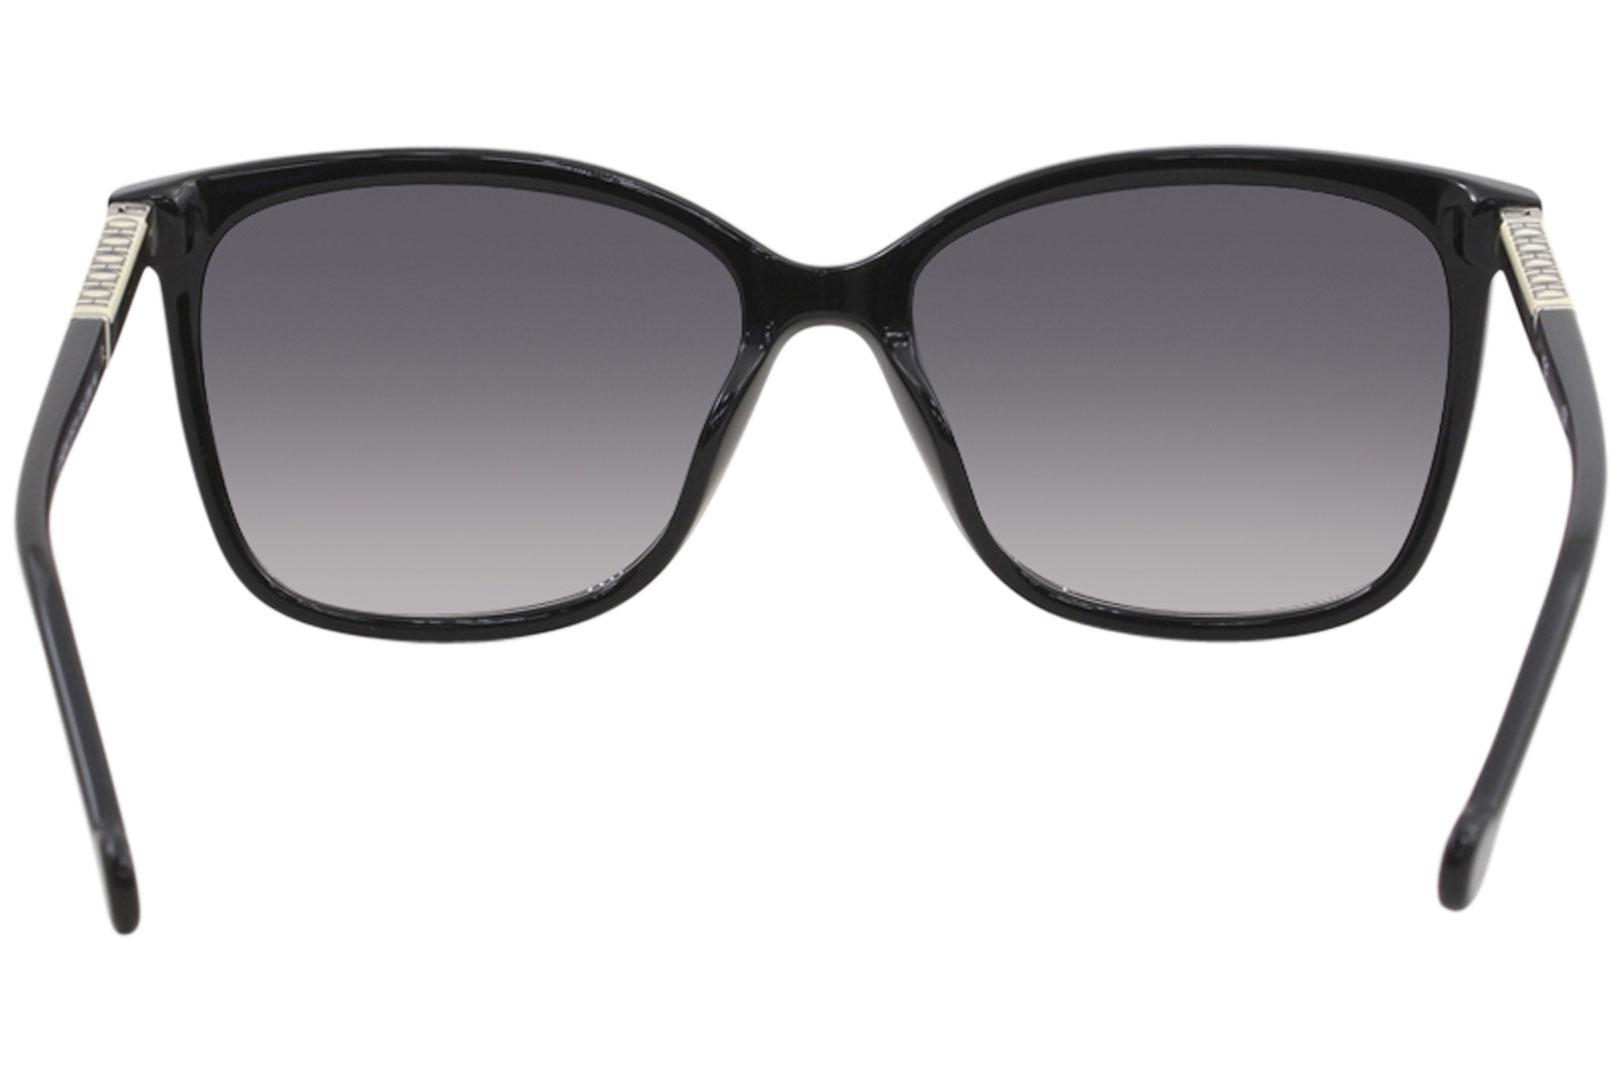 e5ae1b43f68 CH Carolina Herrera Women s SHE702 SHE 702 Fashion Square Sunglasses by  Carolina Herrera